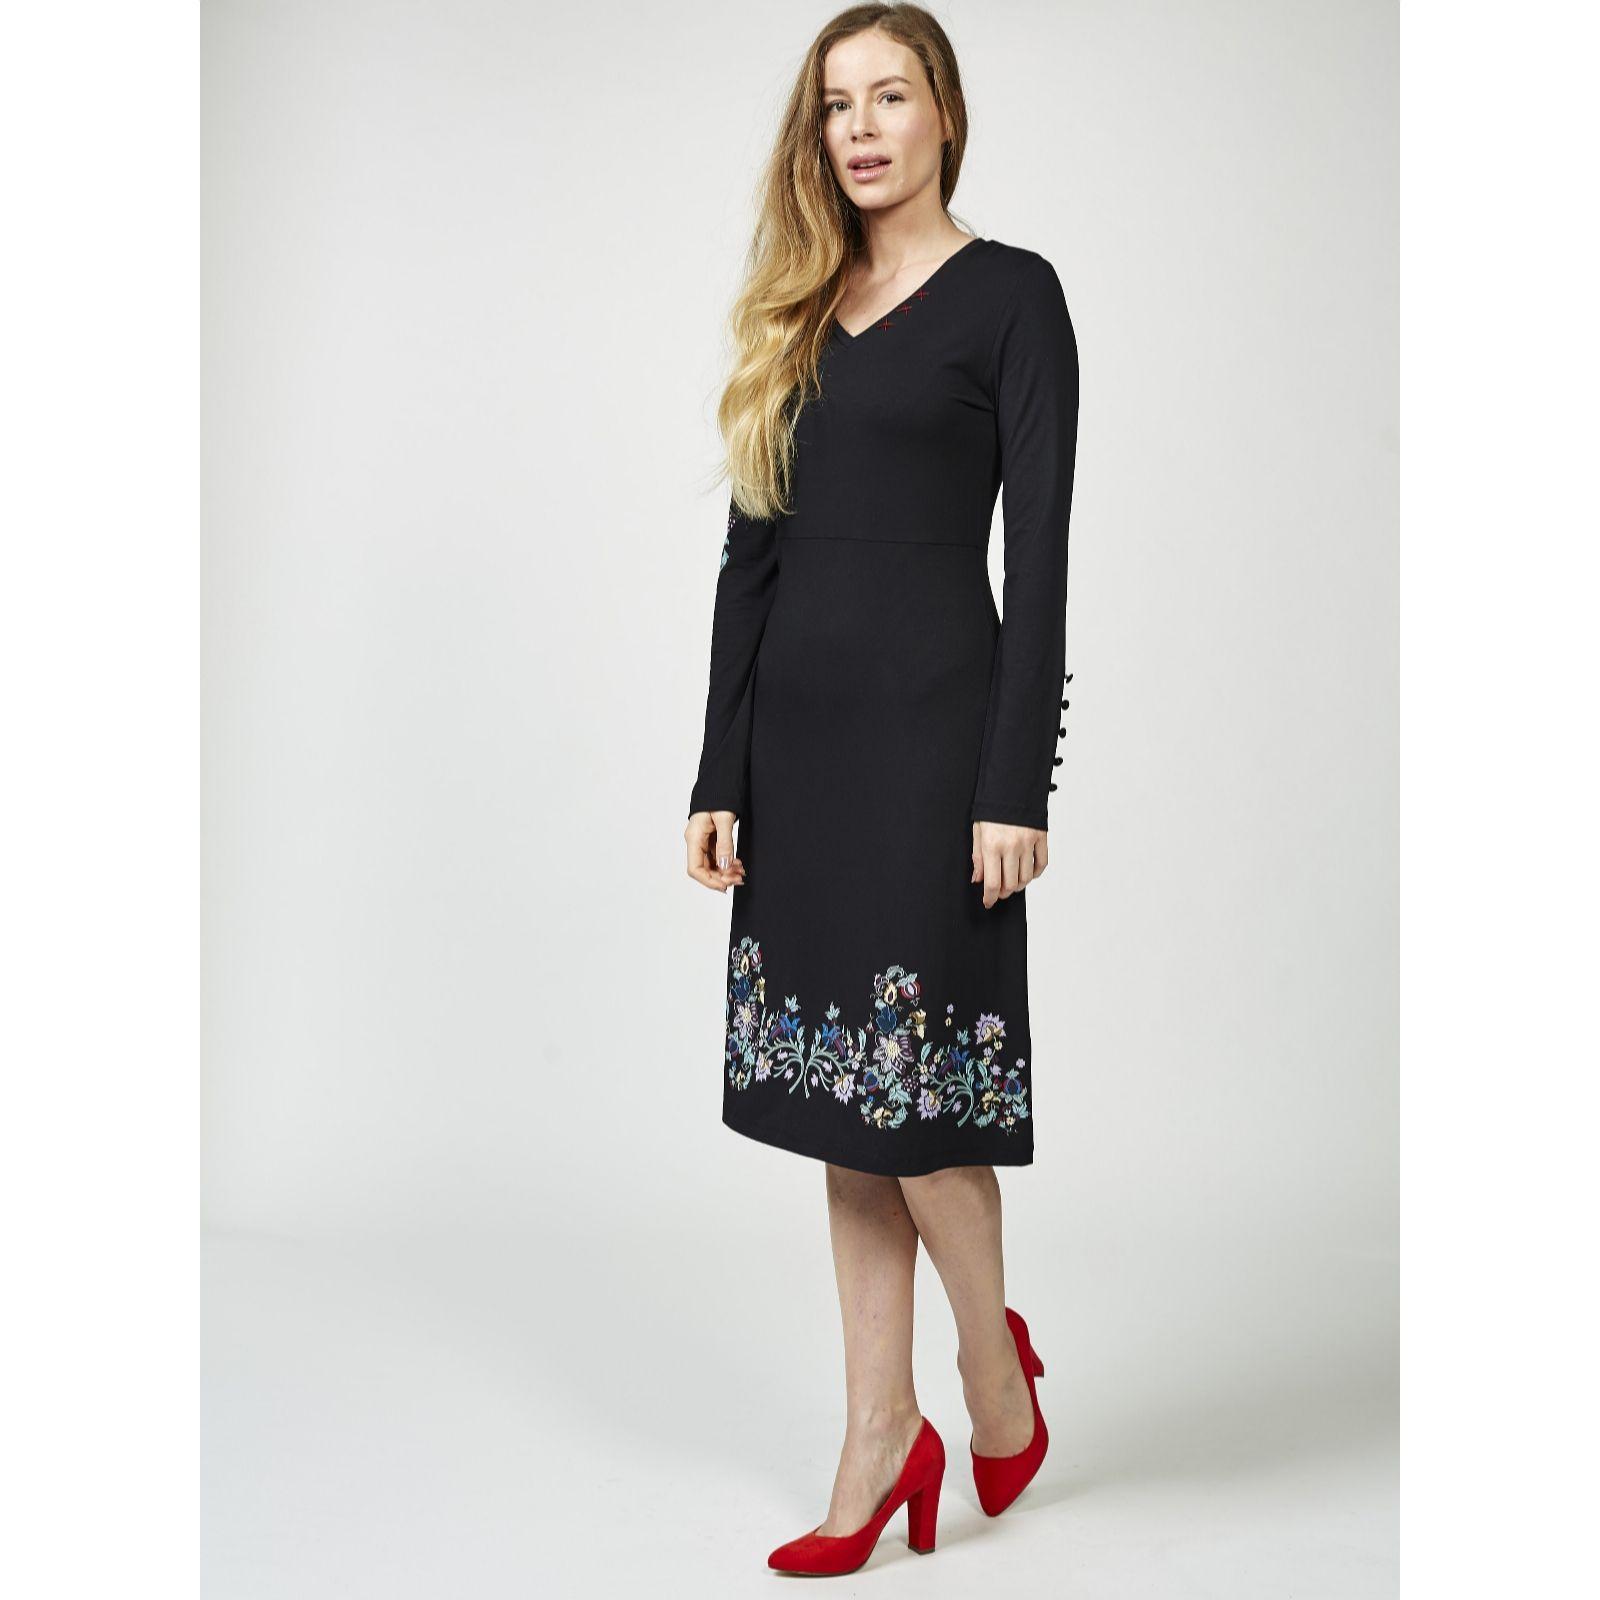 Joe Browns Women\'s Joe\'s Signature Embroidered Knit Long Sleeve Dress B06XDKTB2W